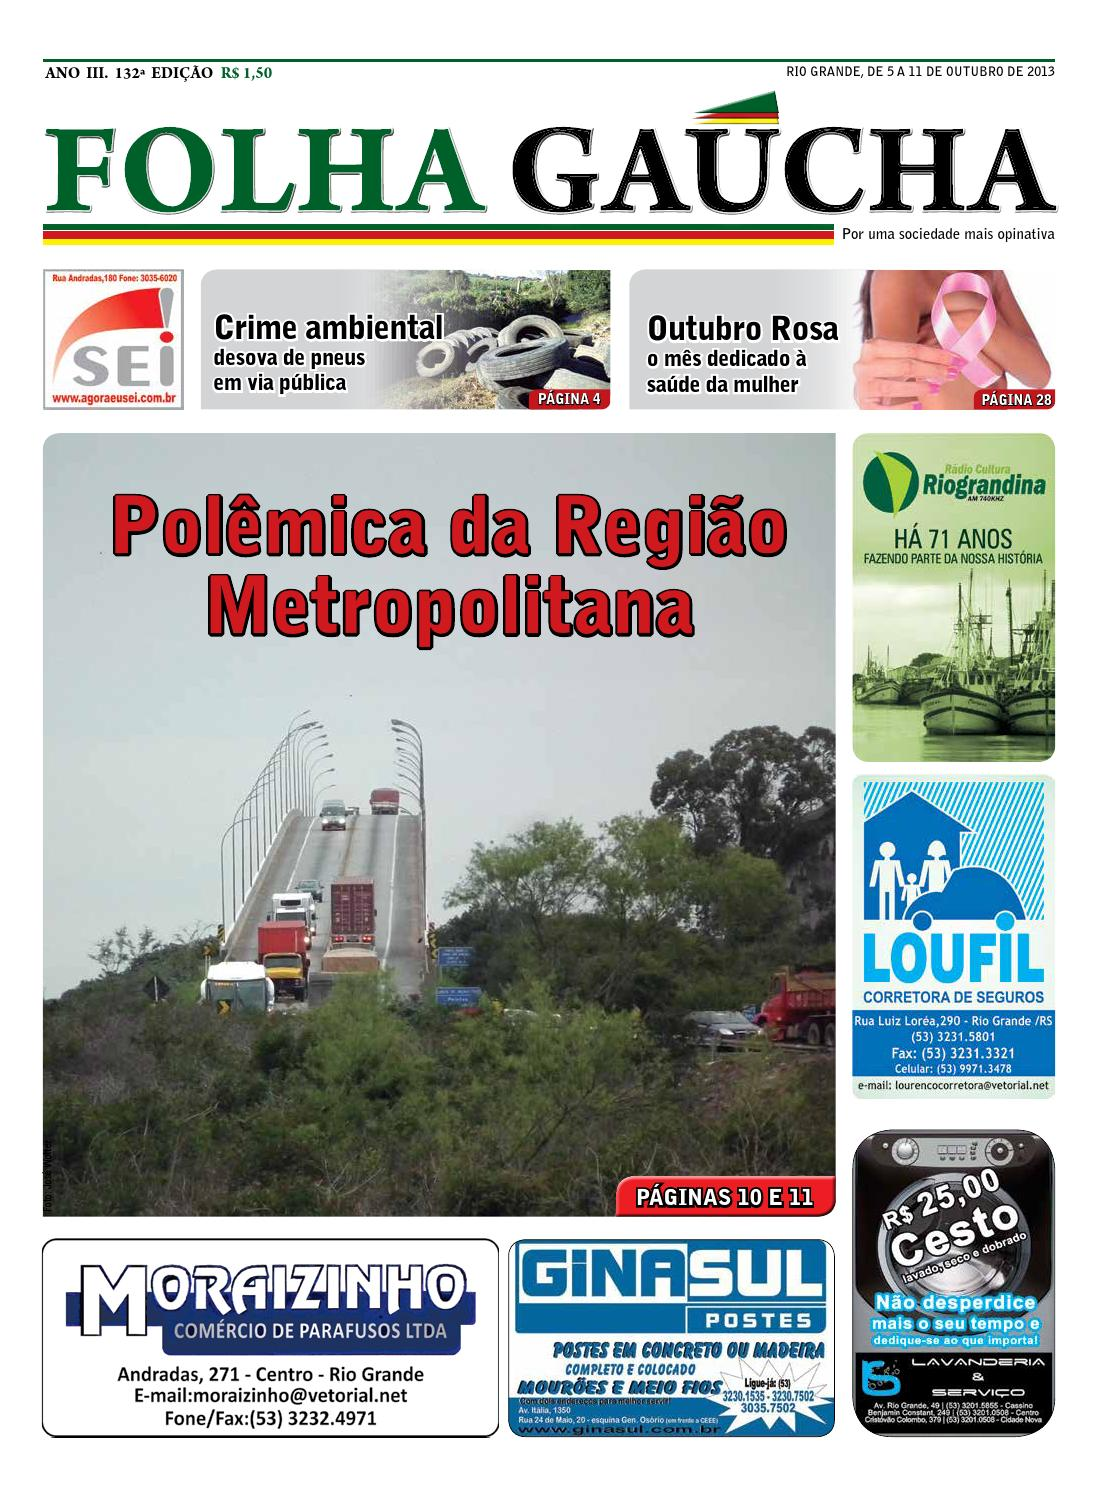 83ce3ed92 Folha gaúcha ed 132 by Folha Gaúcha - issuu